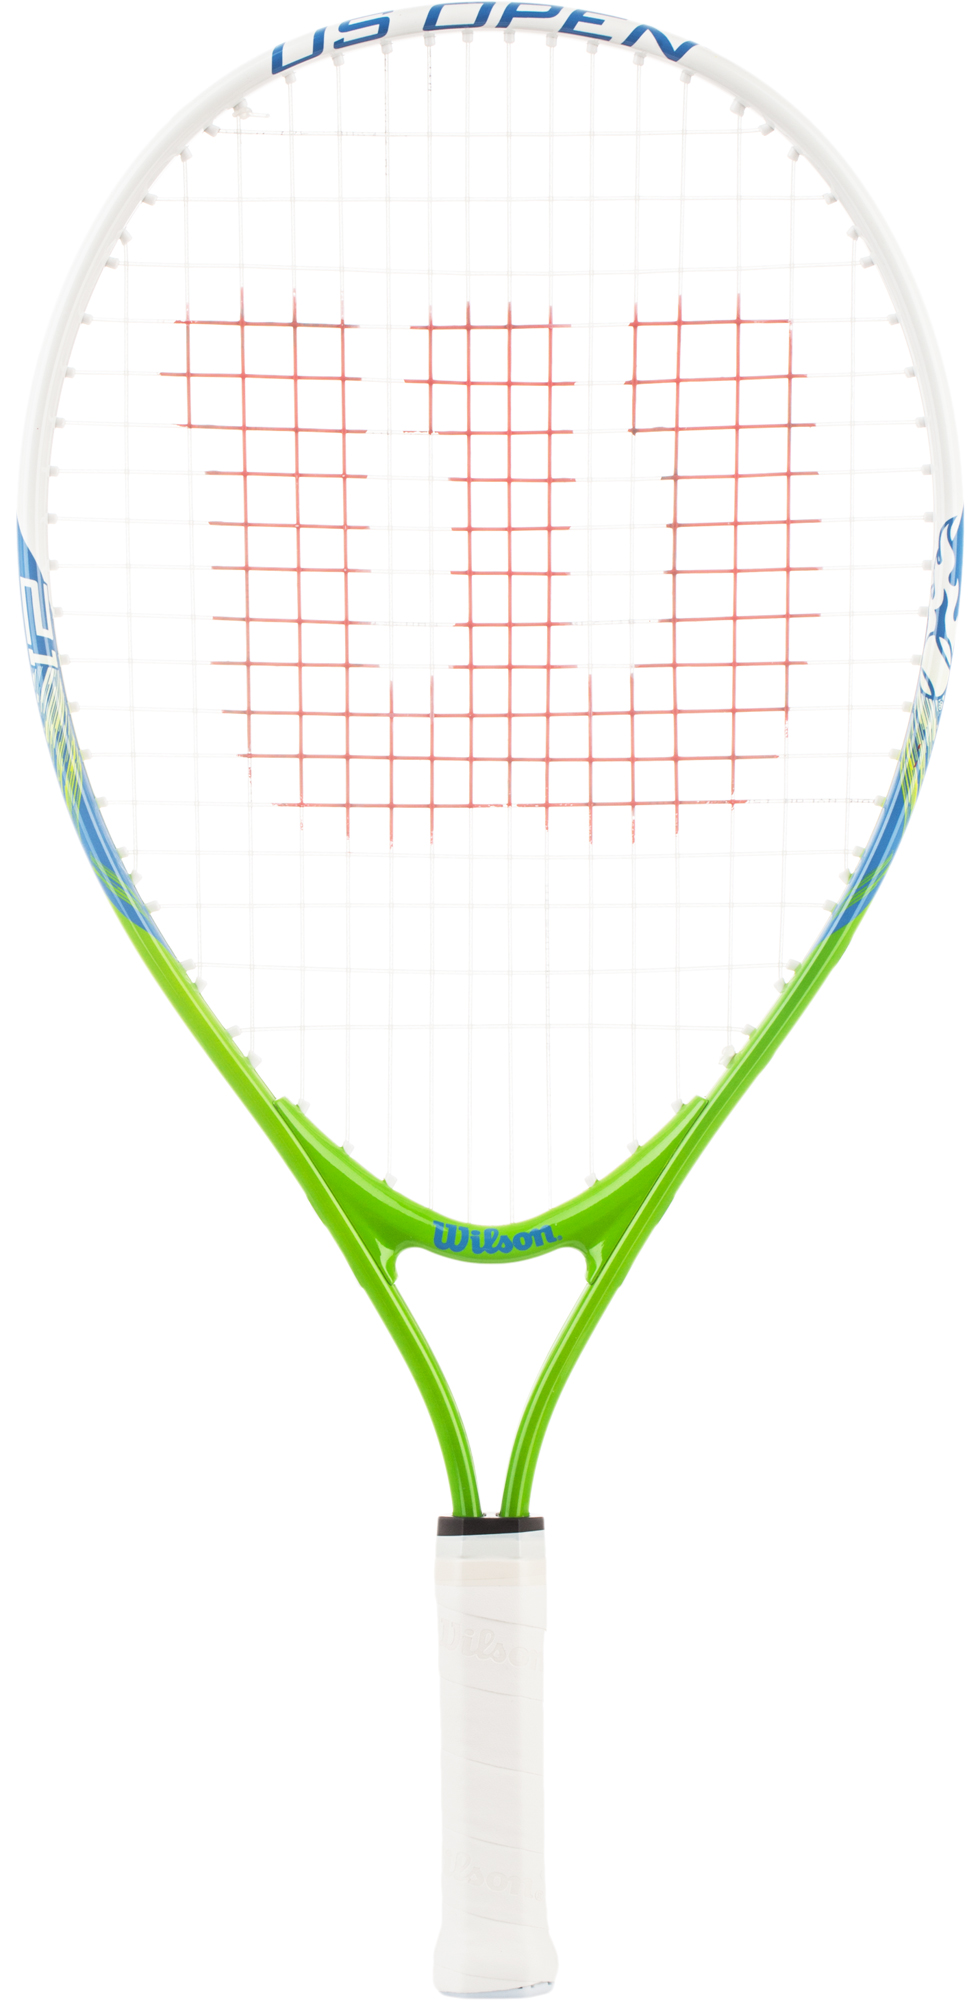 Wilson Ракетка для большого тенниса детская Wilson US Open 21, размер Без размера wilson набор мячей для большого тенниса wilson us open x3 размер без размера